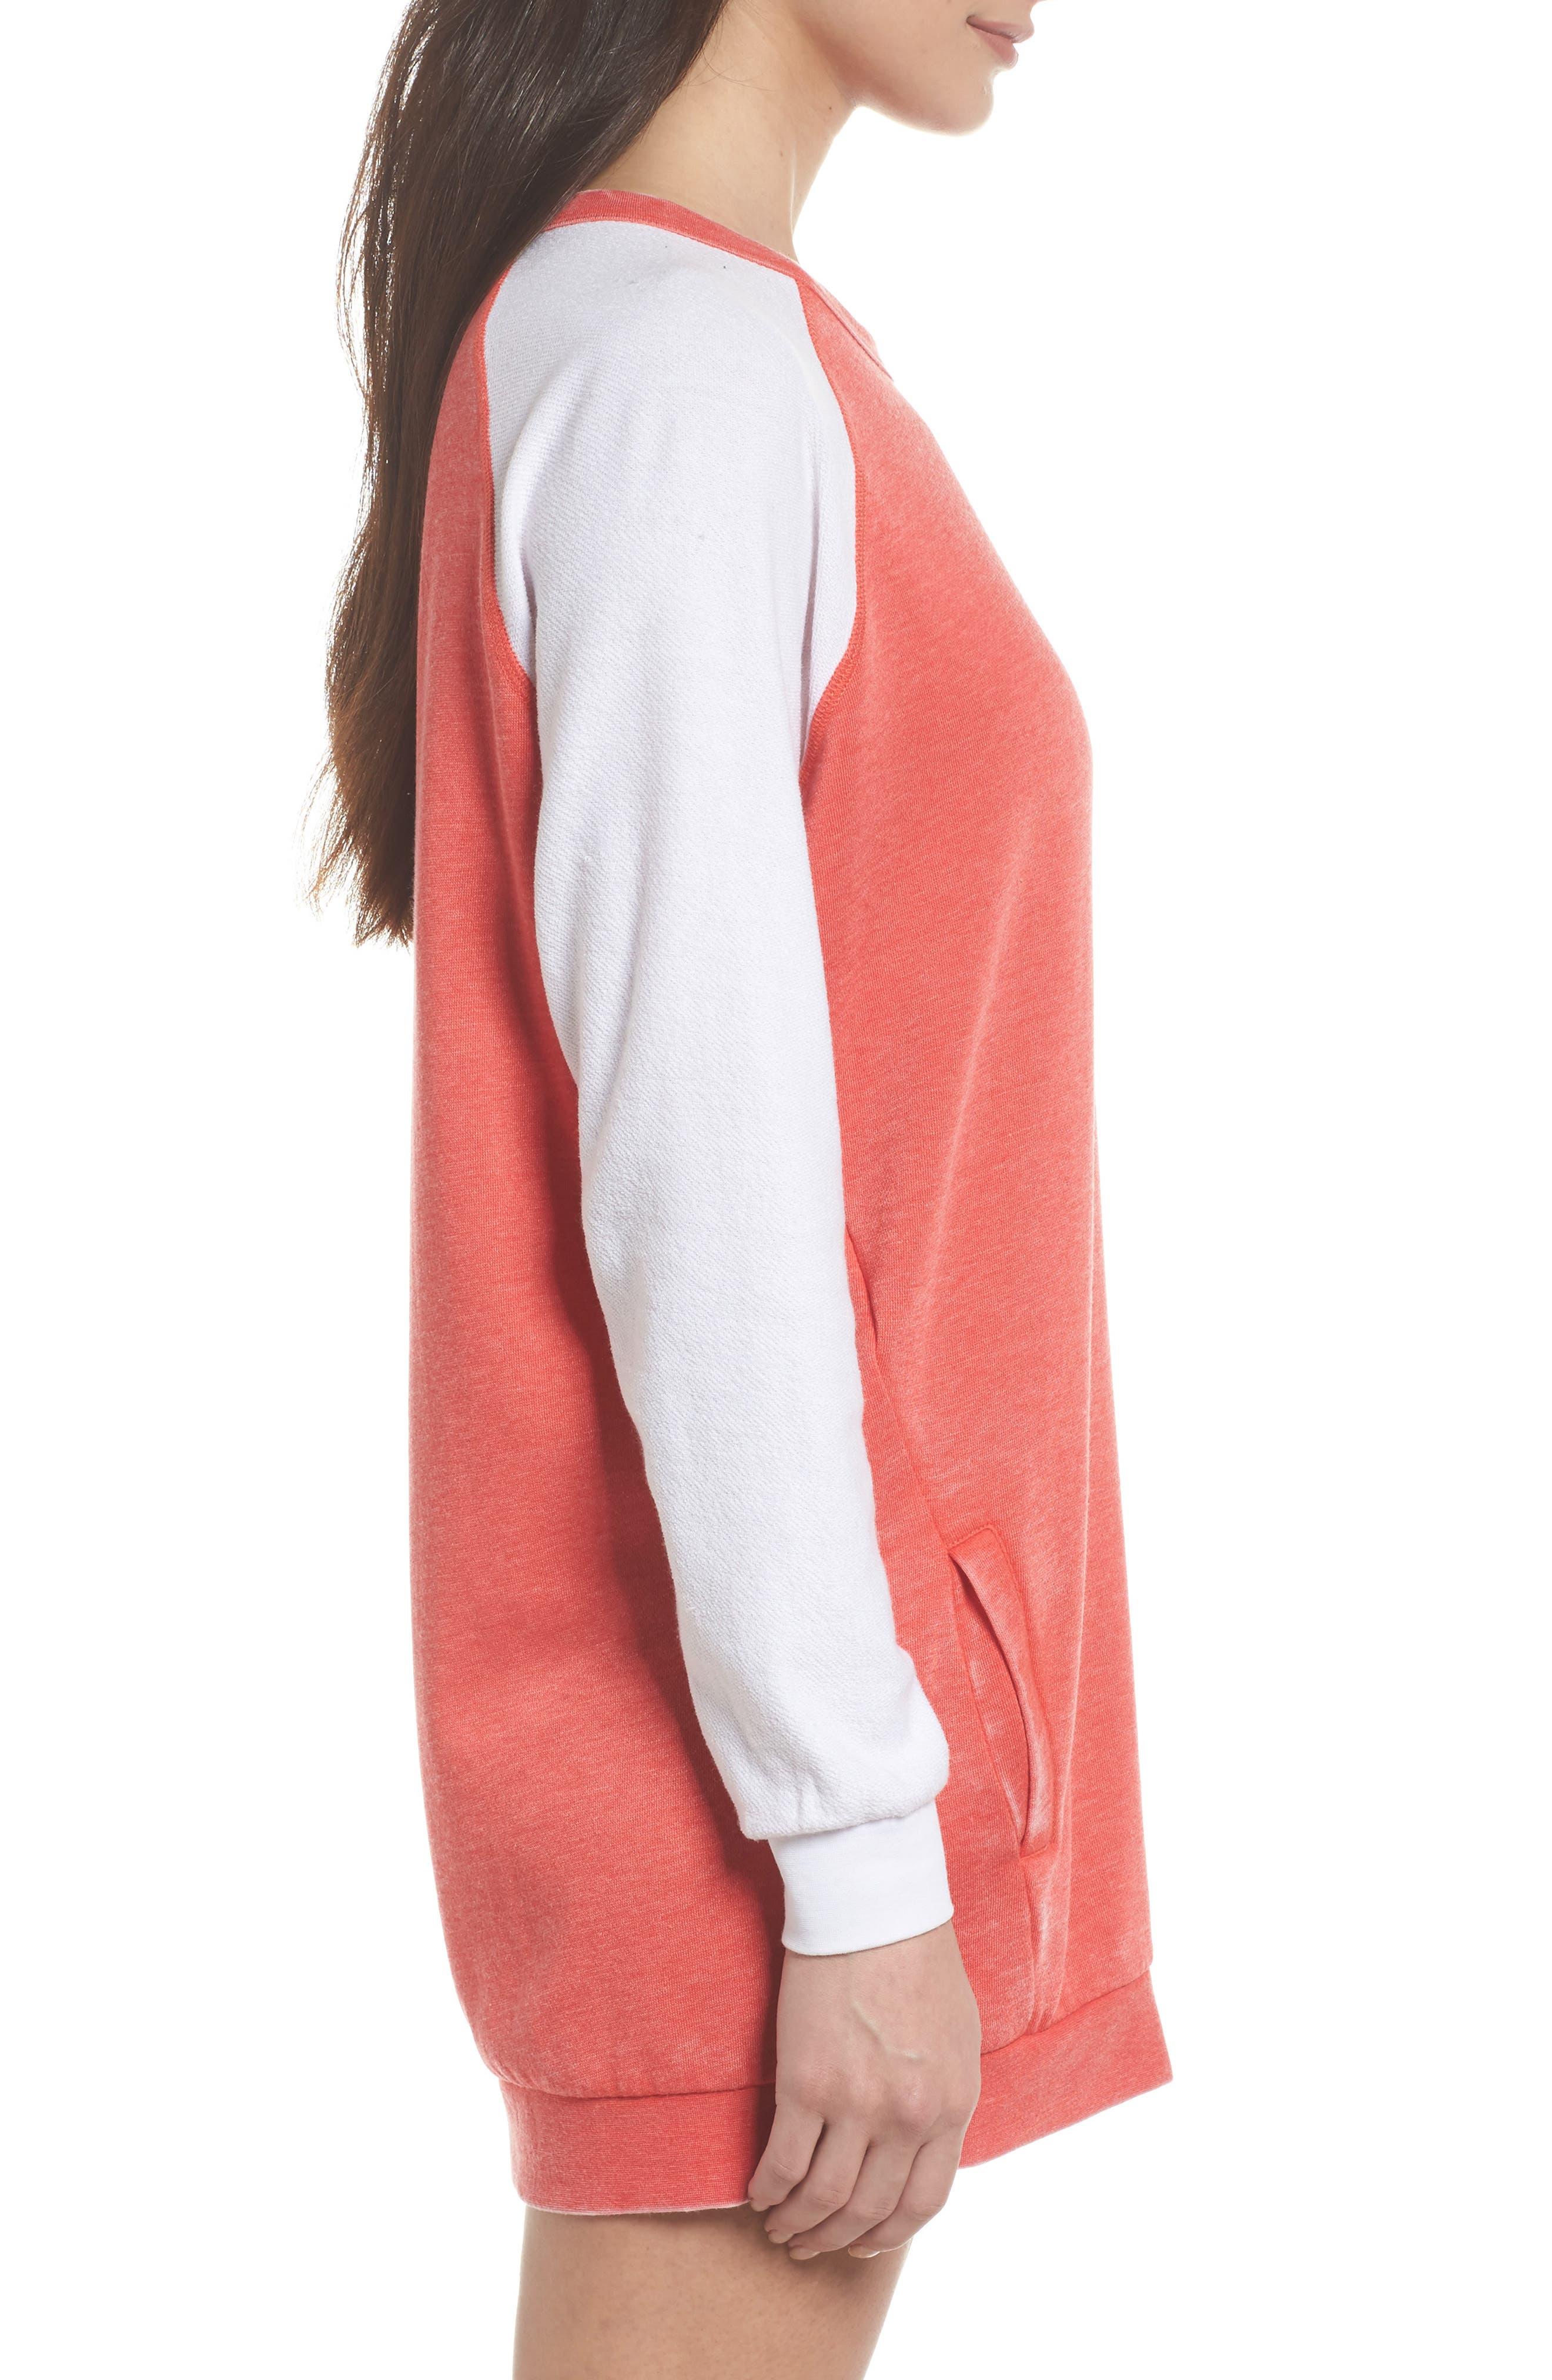 Lounge Sweatshirt Dress,                             Alternate thumbnail 3, color,                             Love Red/ White